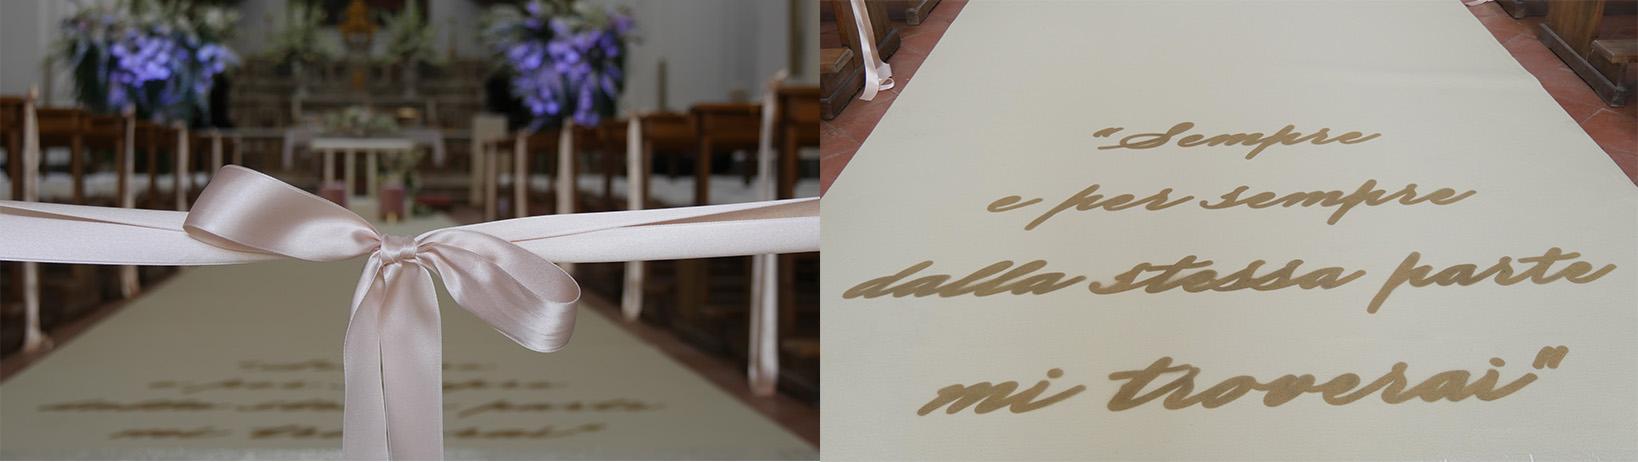 chiesa allestimenti wedding